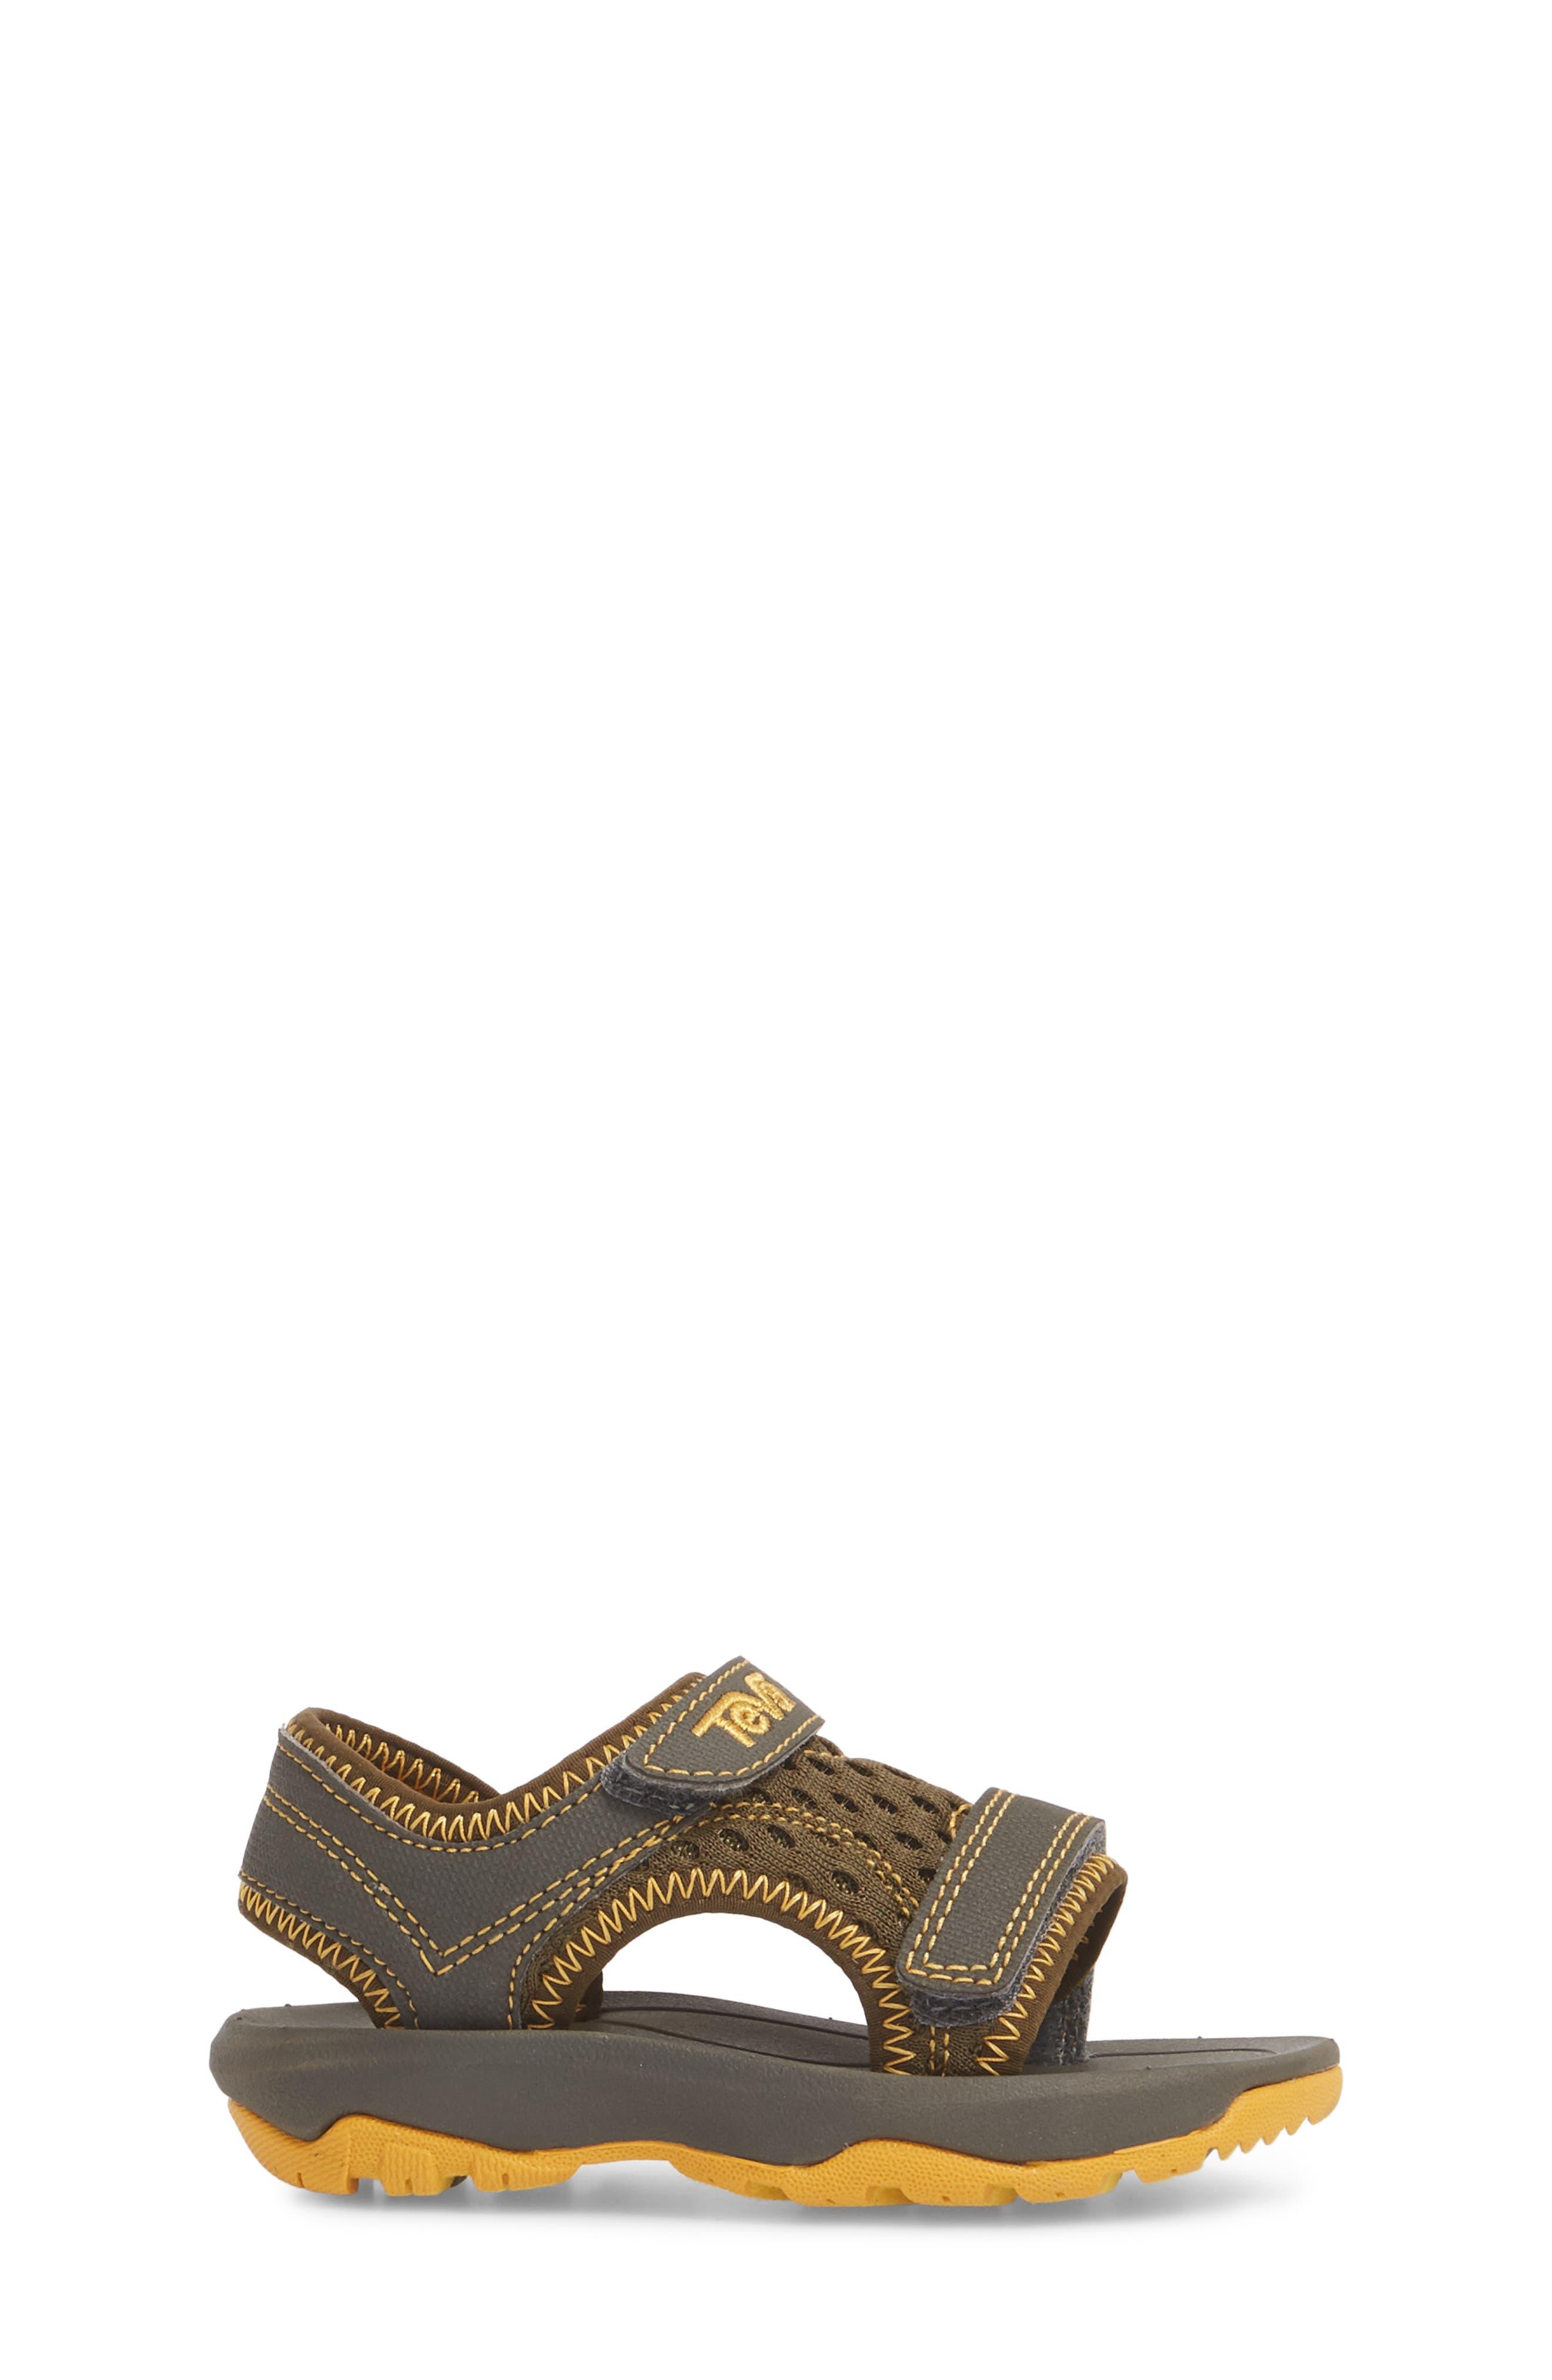 Psyclone XLT Sandal,                             Alternate thumbnail 3, color,                             Dark Olive